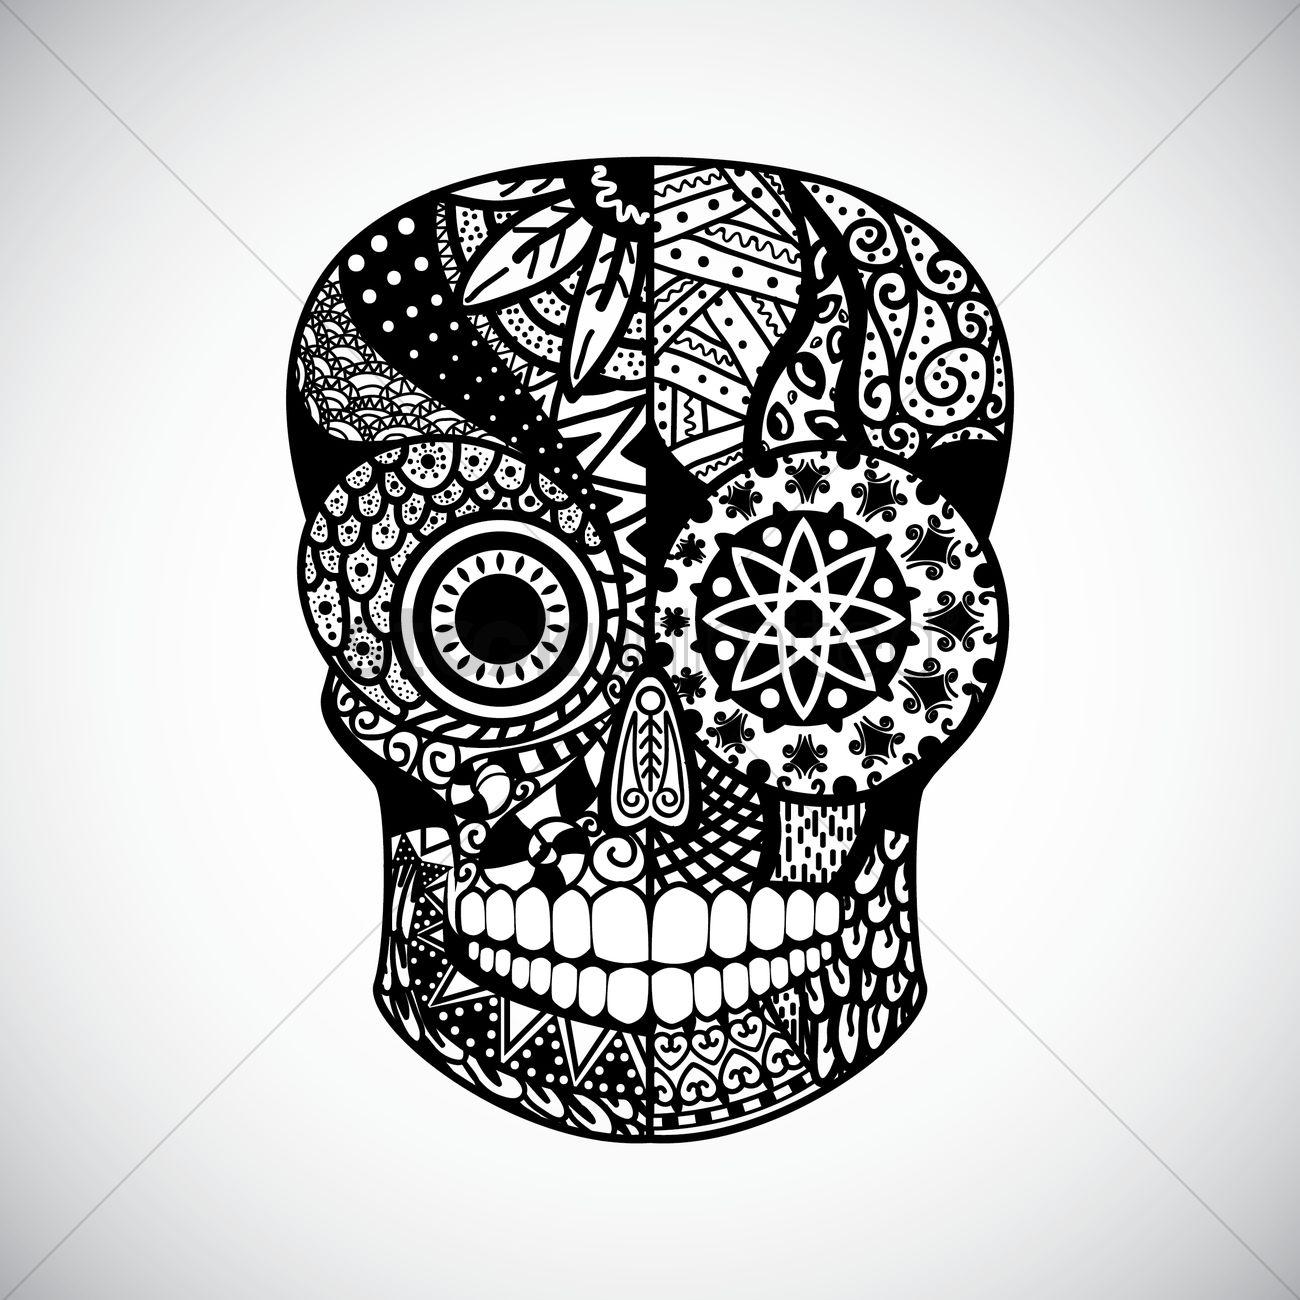 Vector Illustration Web Designs: Intricate Skull Design Vector Image - 1555094